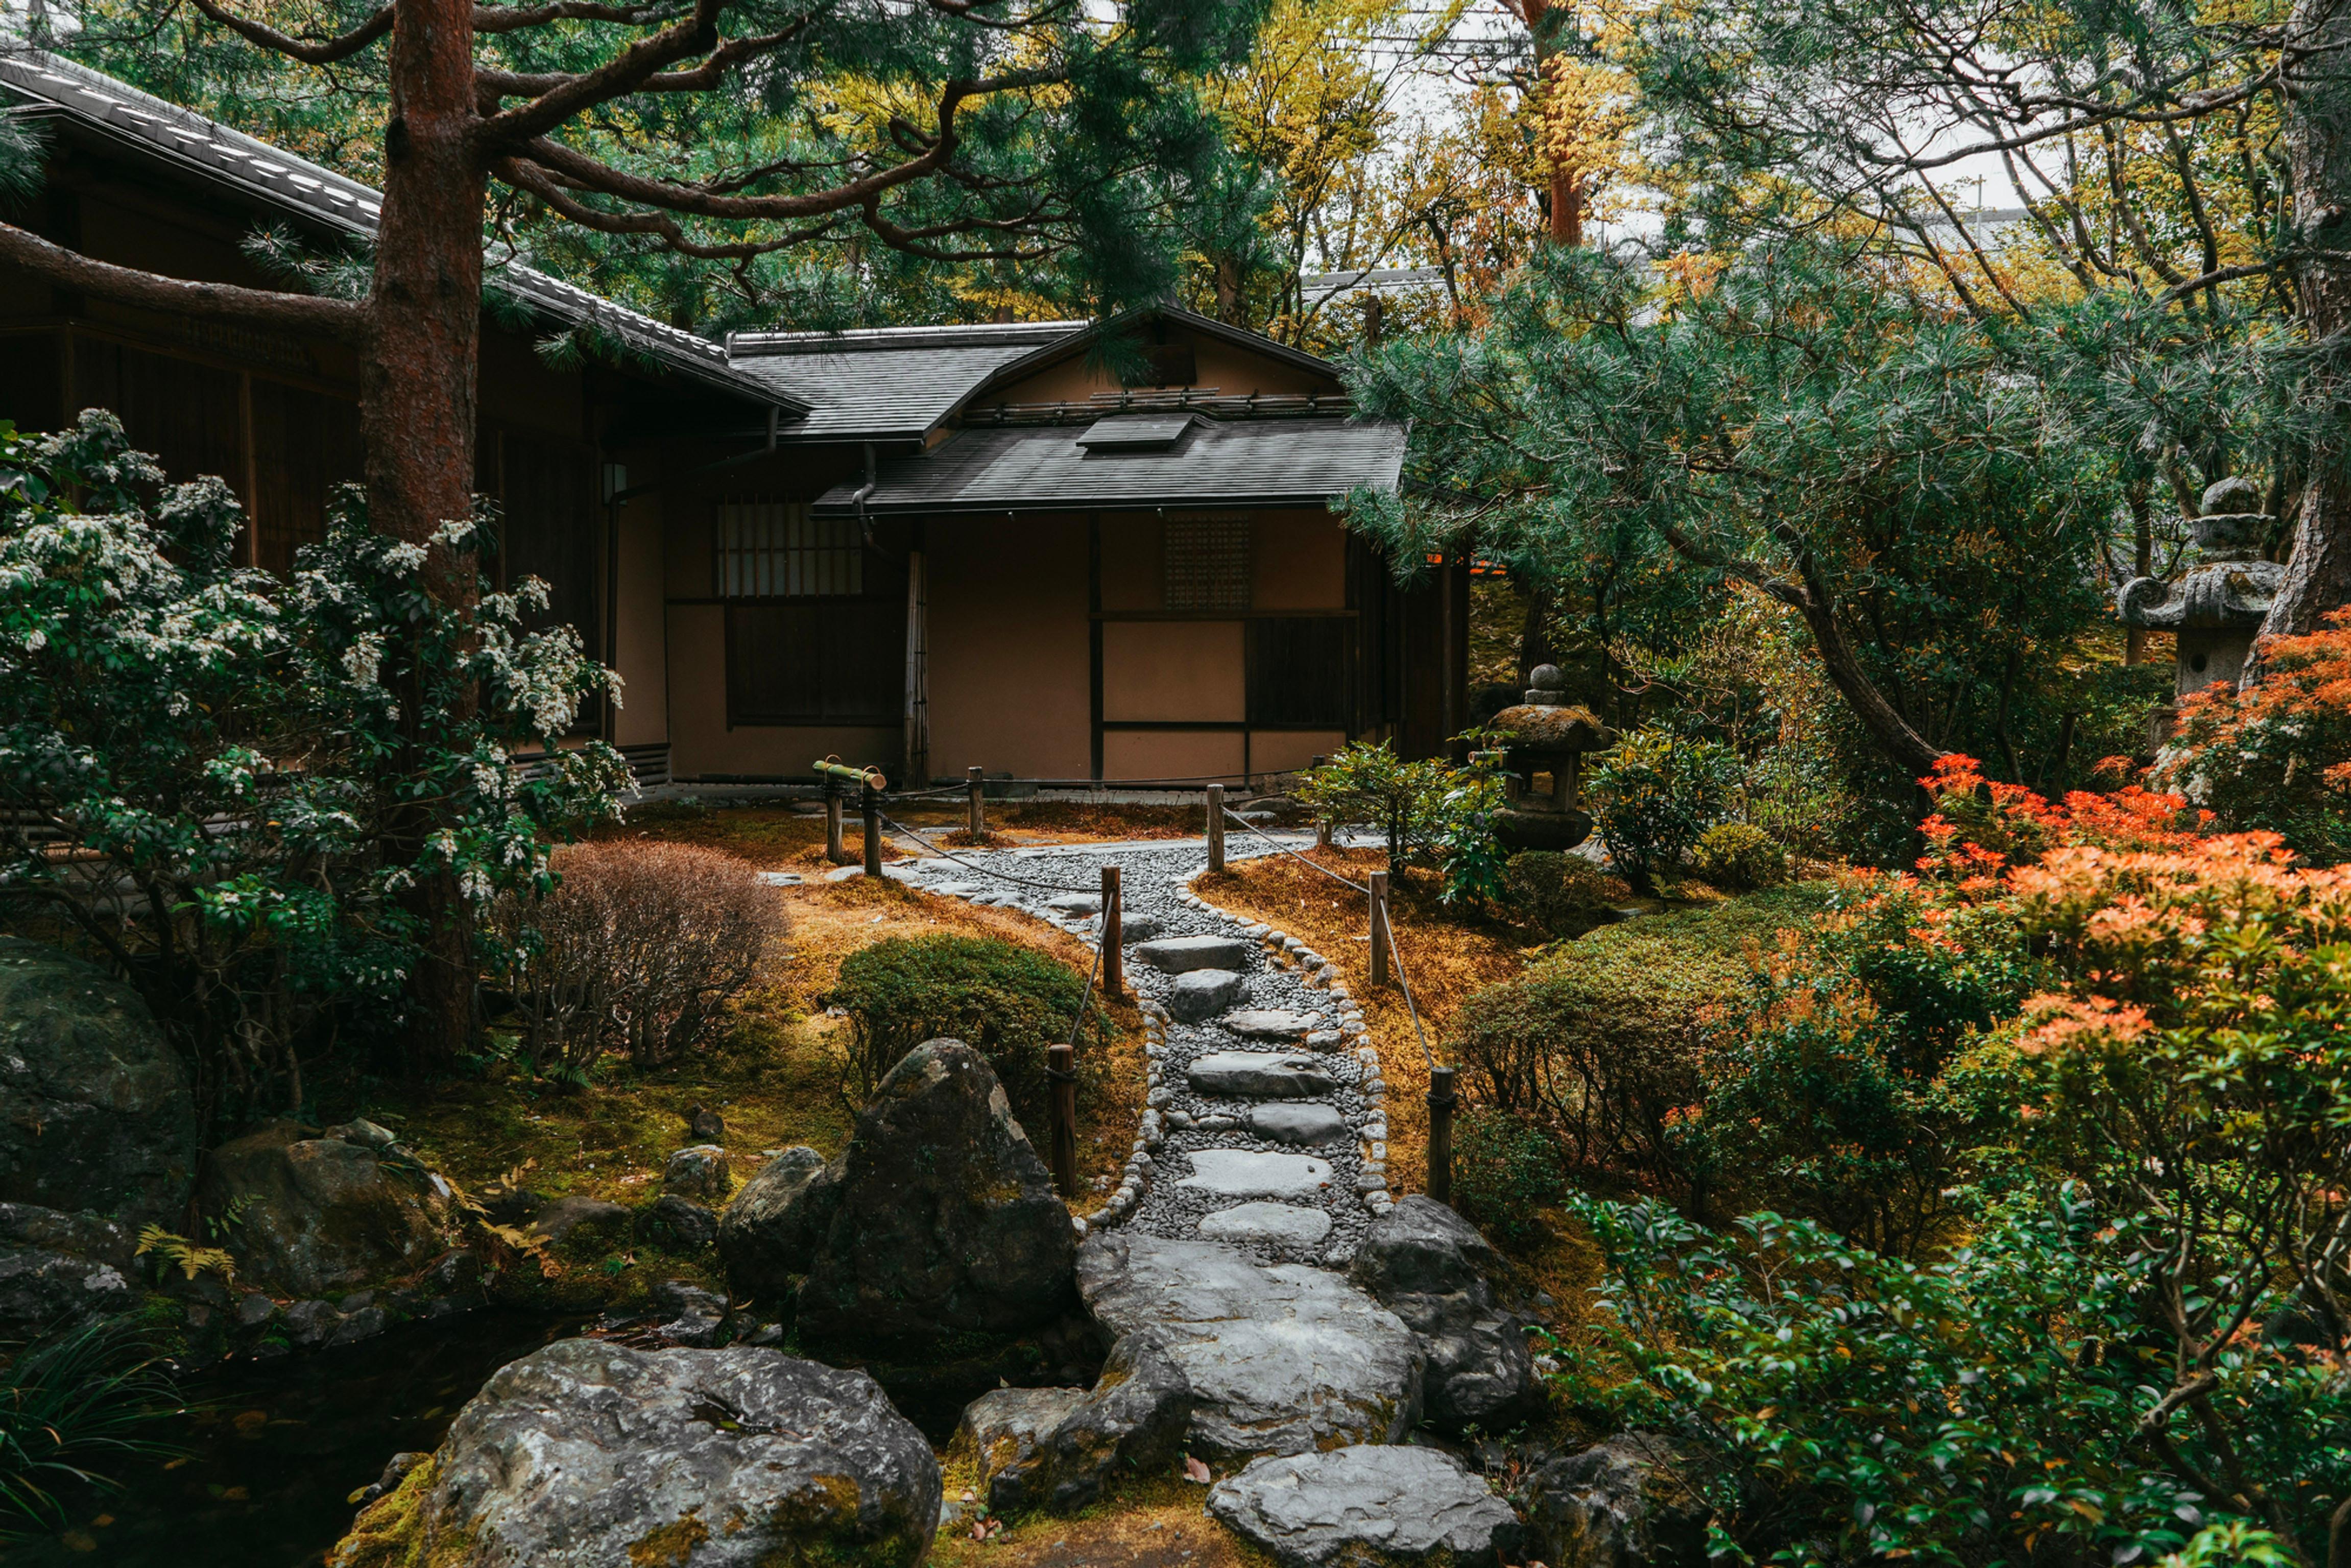 11月体験講座(都内 西新井/オンライン講座同時開催)